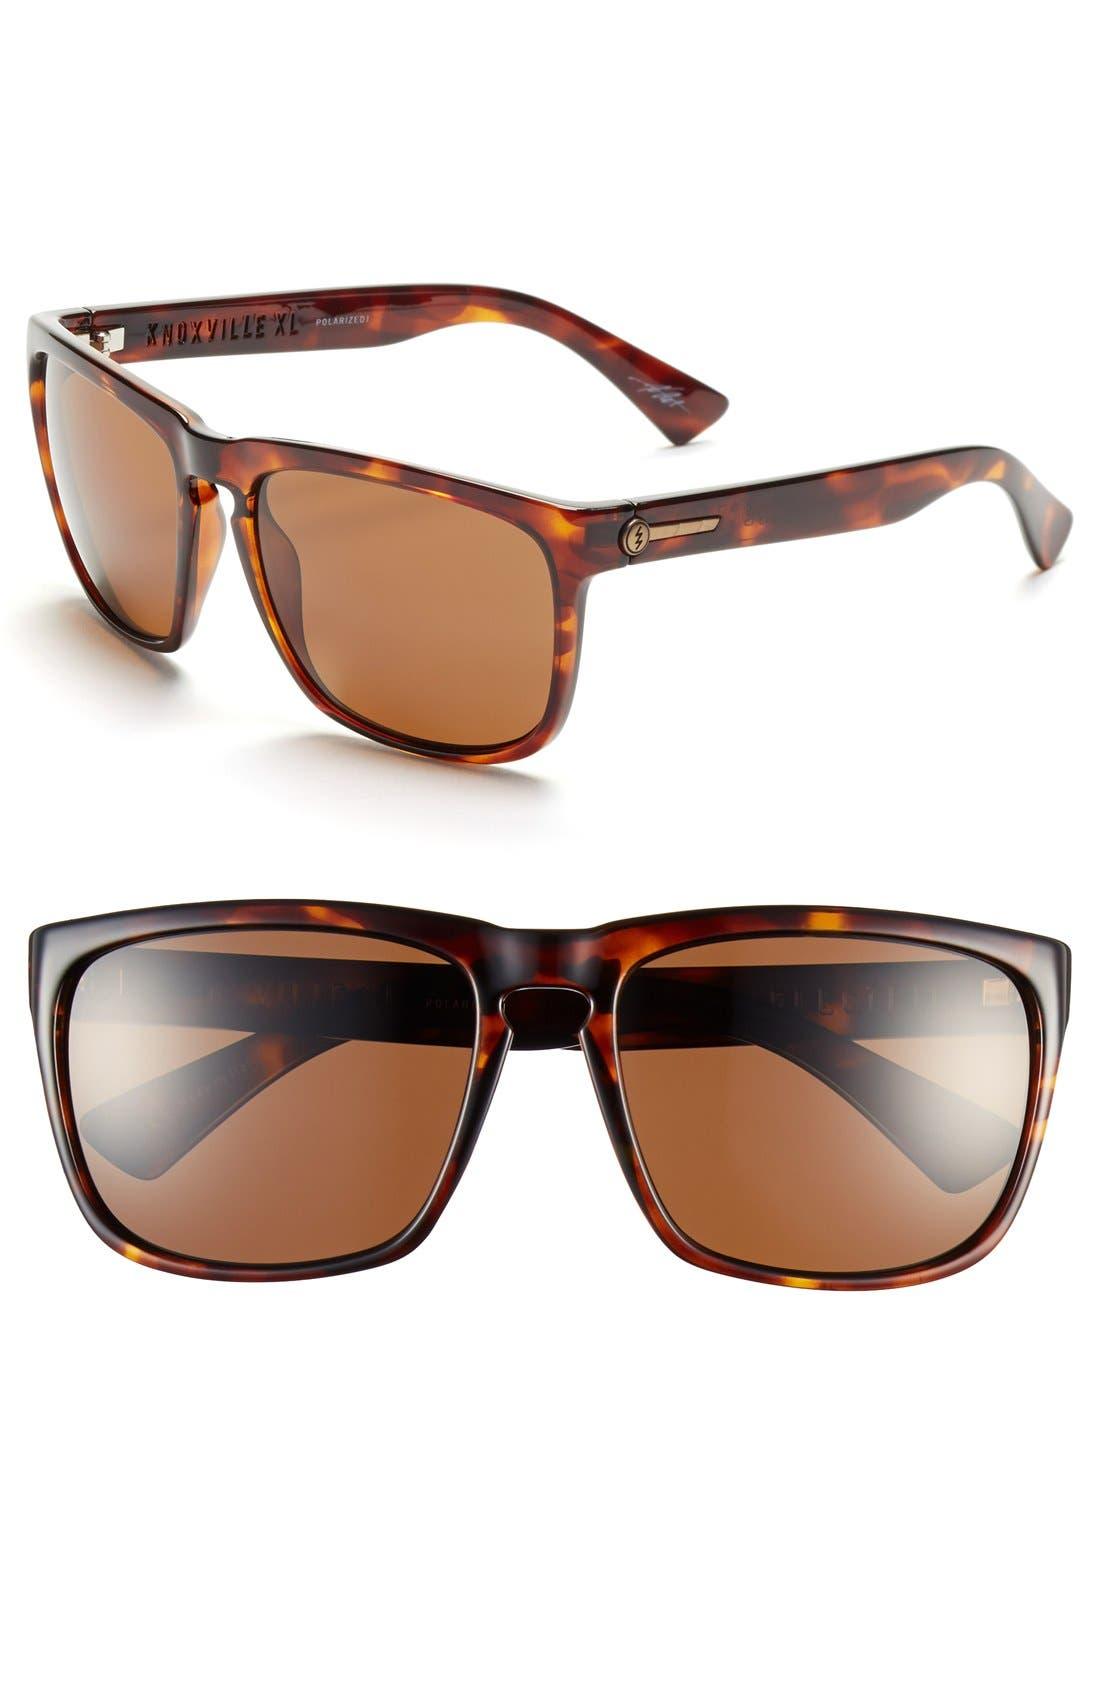 'Knoxville XL' 61mm Polarized Sunglasses,                             Main thumbnail 1, color,                             TORTOISEOISE SHELL/  BRONZE